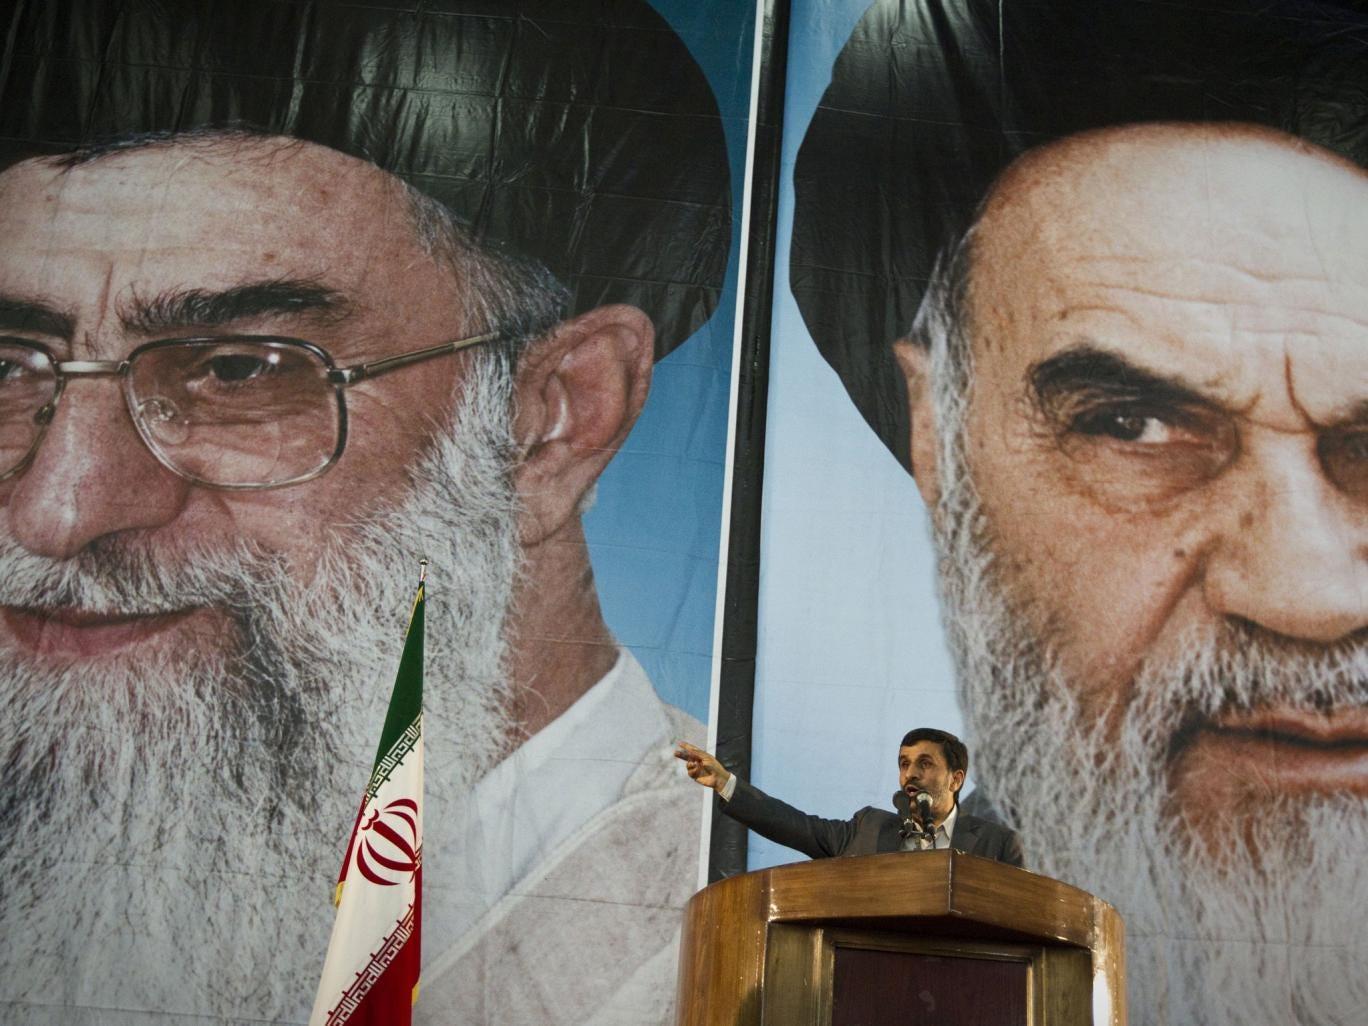 President Ahmadinejad is dwarfed by posters of  the Supreme Leader, Ayatollah Ali Khamenei, left, and Ayatollah Ruhollah Khomeini